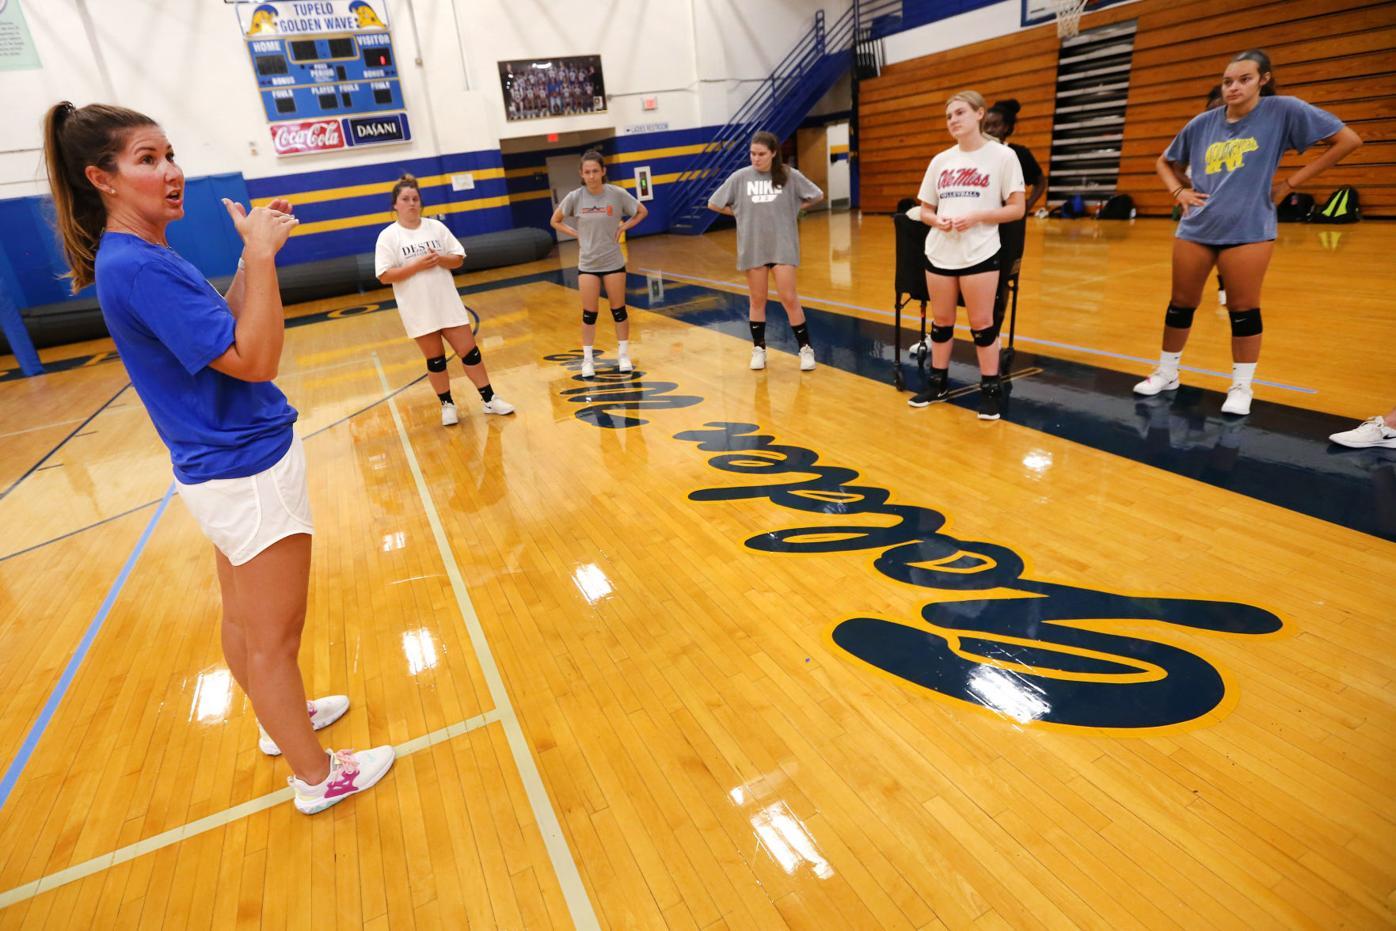 djr-2020-08-12-sport-tupelo-volleyball-arp1